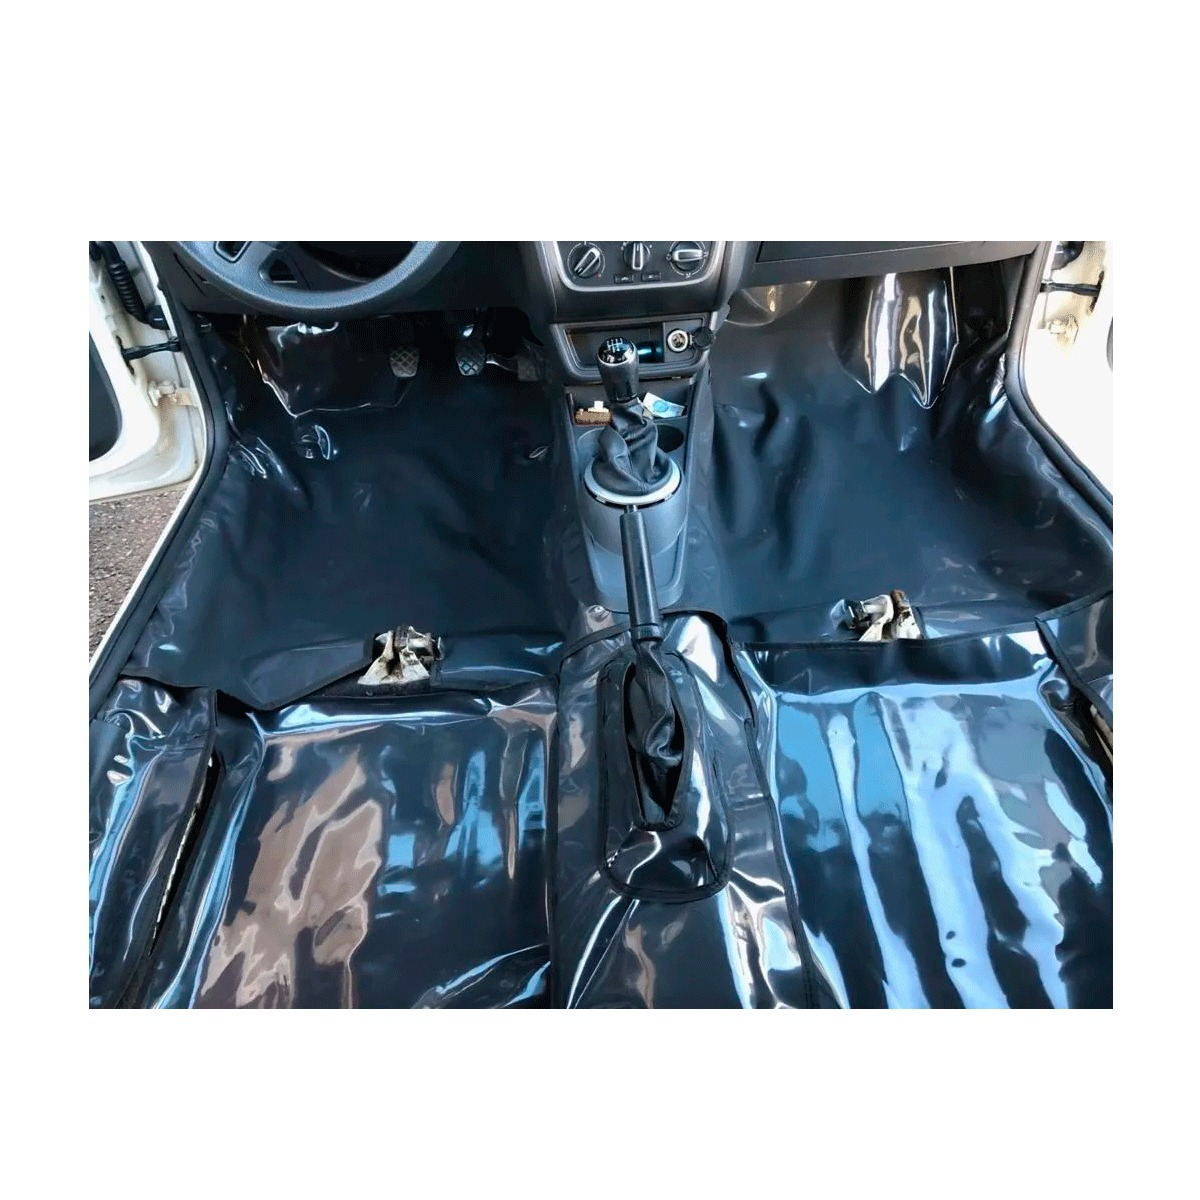 Tapete Em Vinil Chevrolet S10 Dupla 95 a 2011 + Capa Banco Protecao Banco Areia Suor Academia